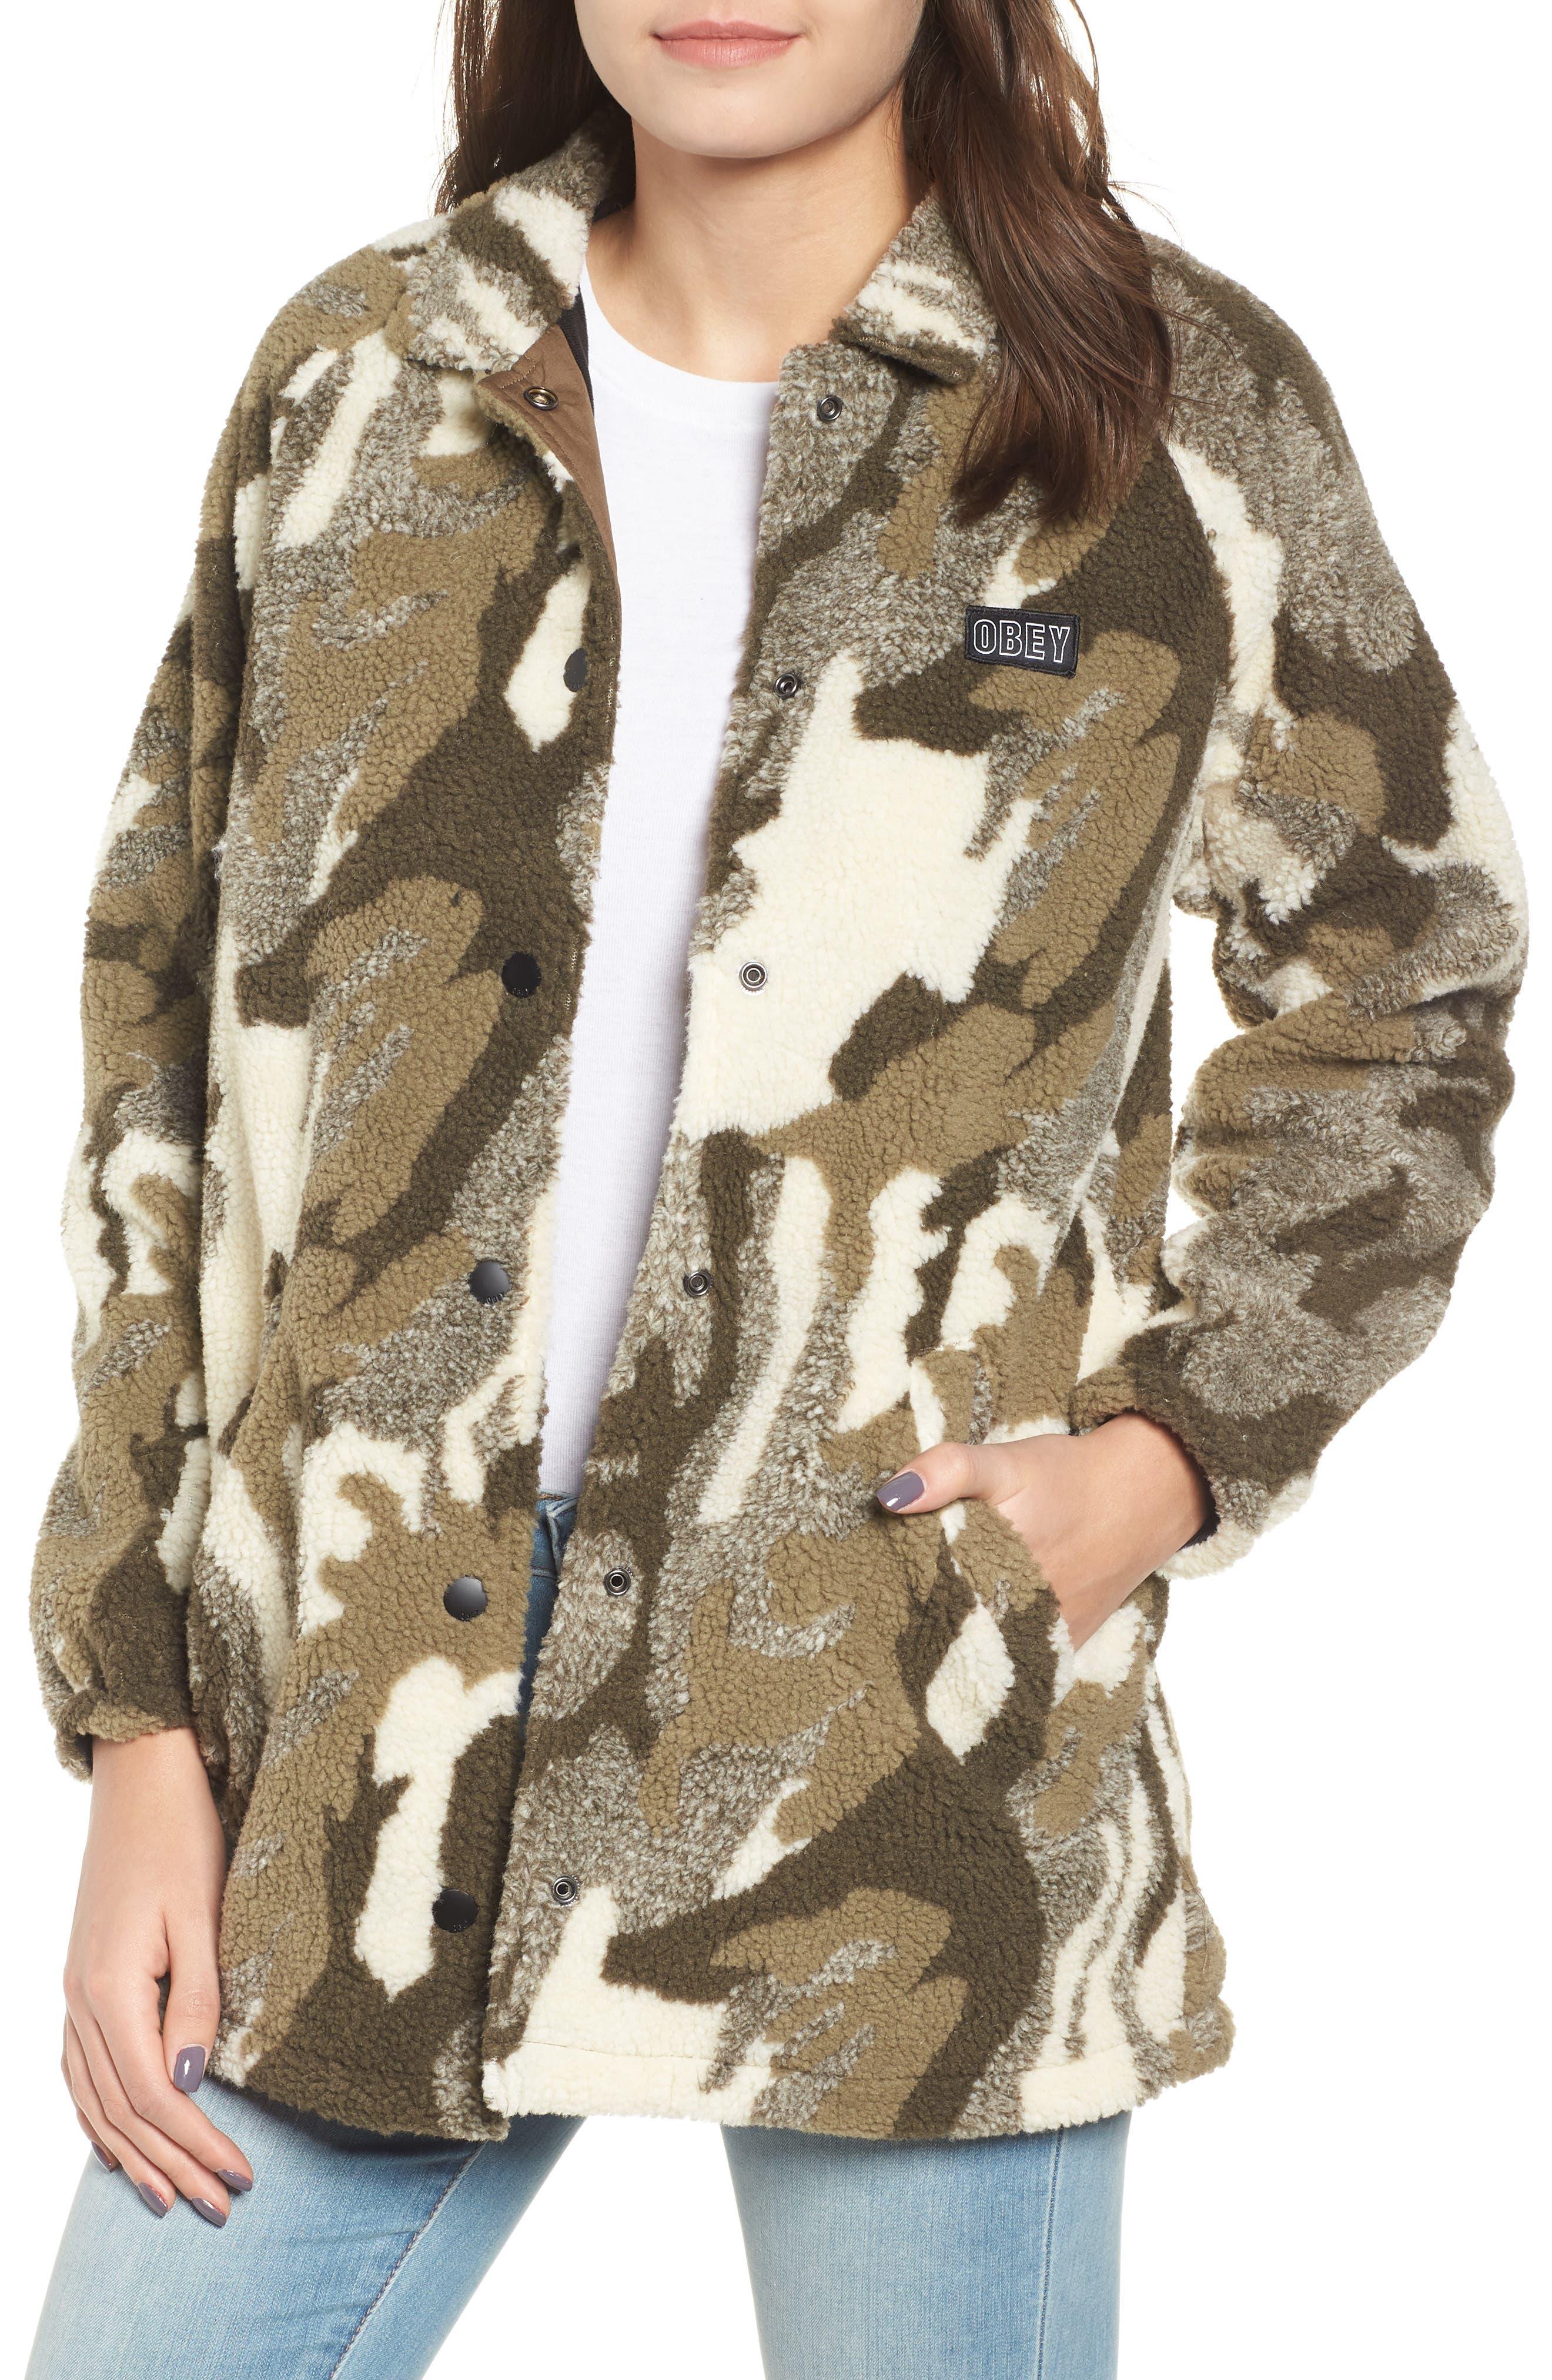 Obey Covert Fleece Jacket, Green